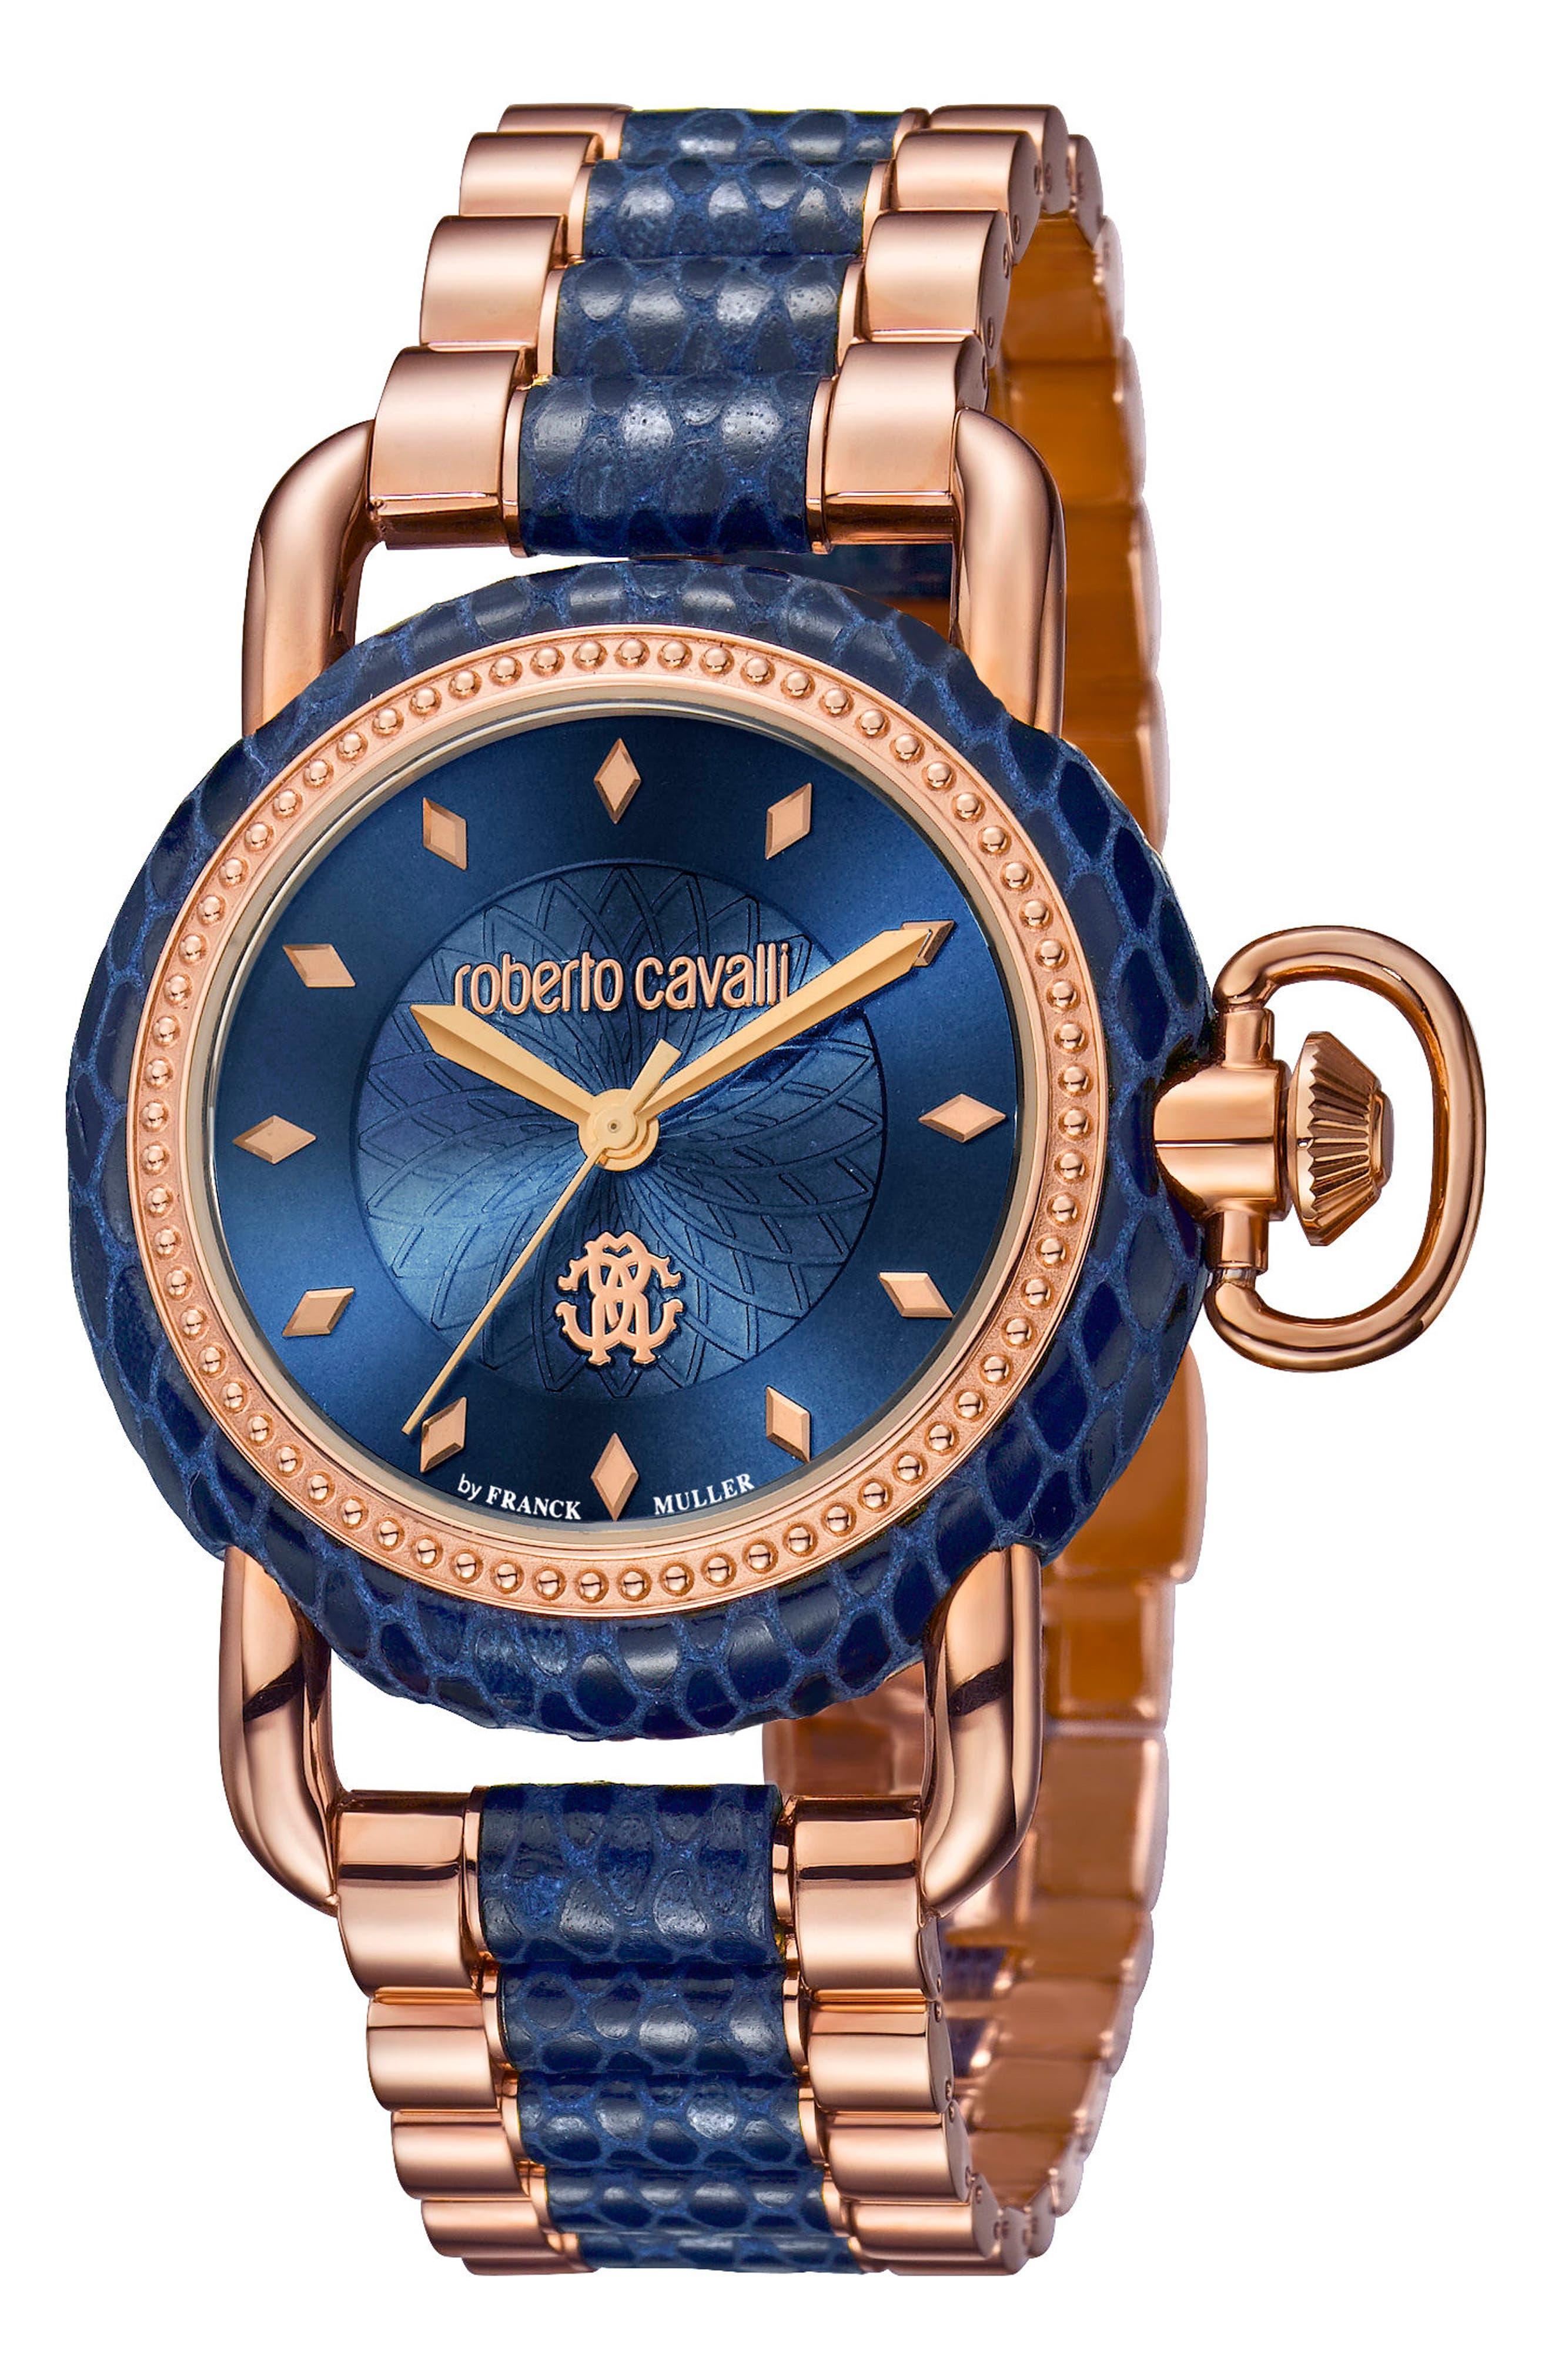 Roberto Cavalli by Franck Muller Snake Bracelet Watch, 36mm